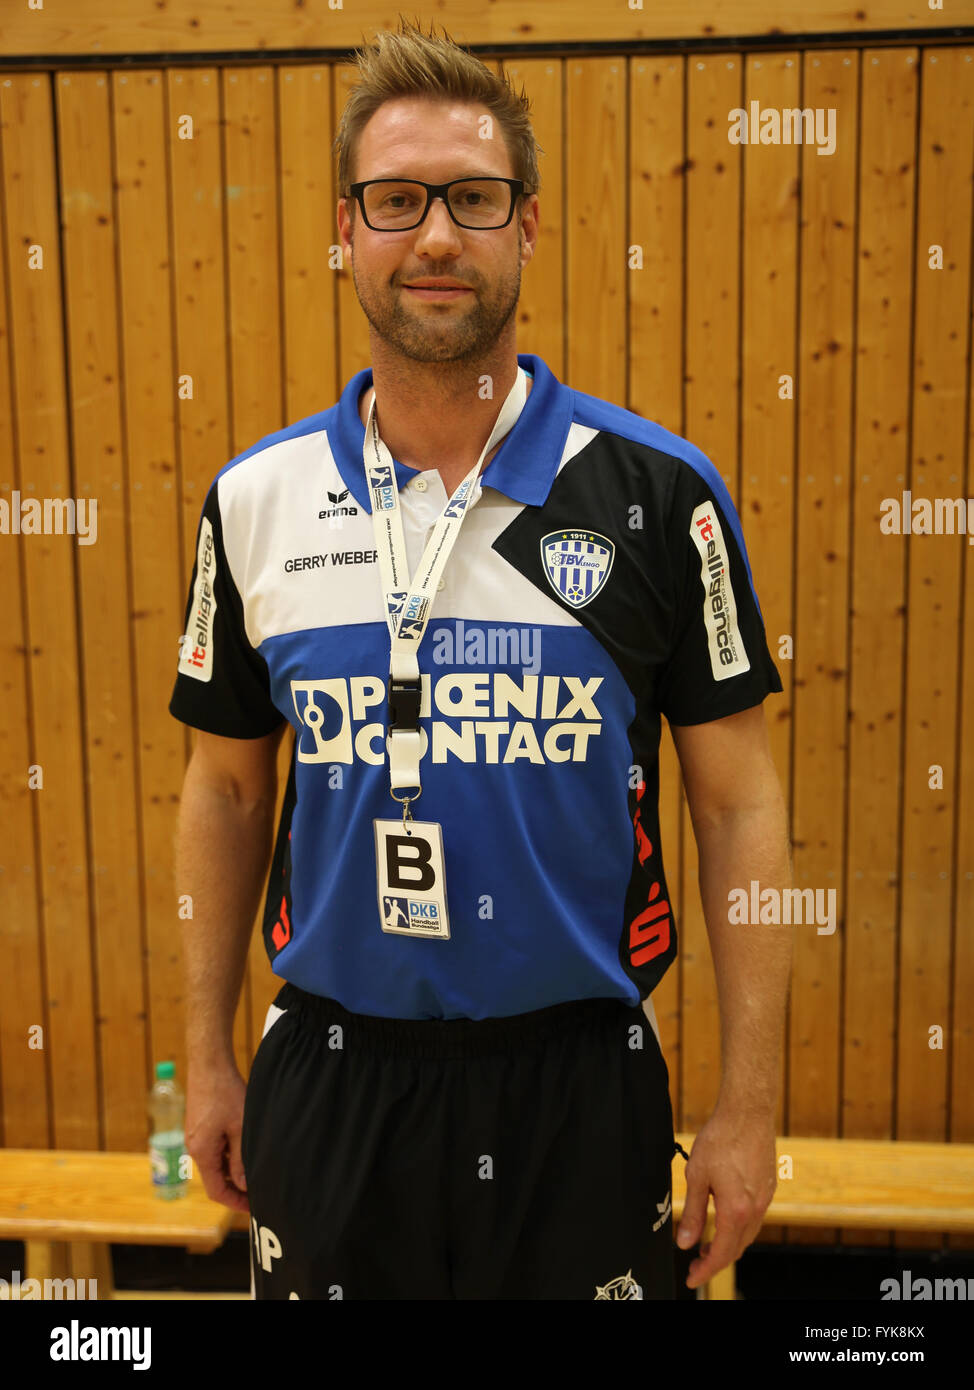 Niels Pfannenschmidt (TBV Lemgo) - Stock Image